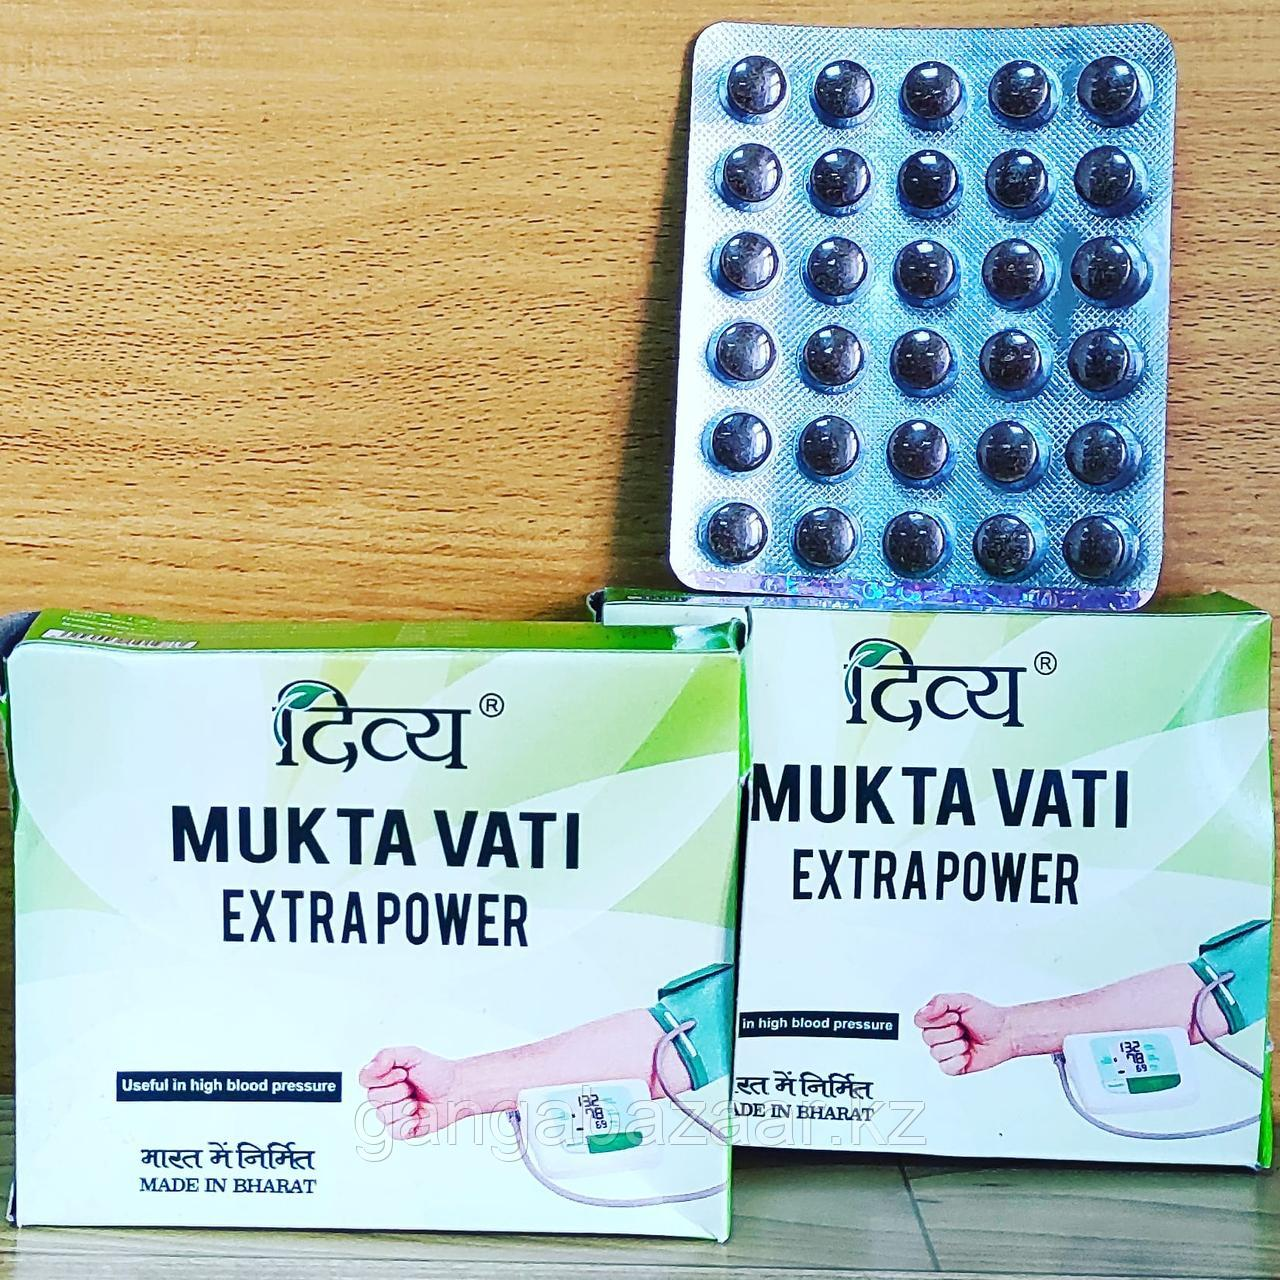 Мукта Вати Дивья (MUKTA VATI Divya Pharmavy) - экстра сила при гипертонии, 120 таб